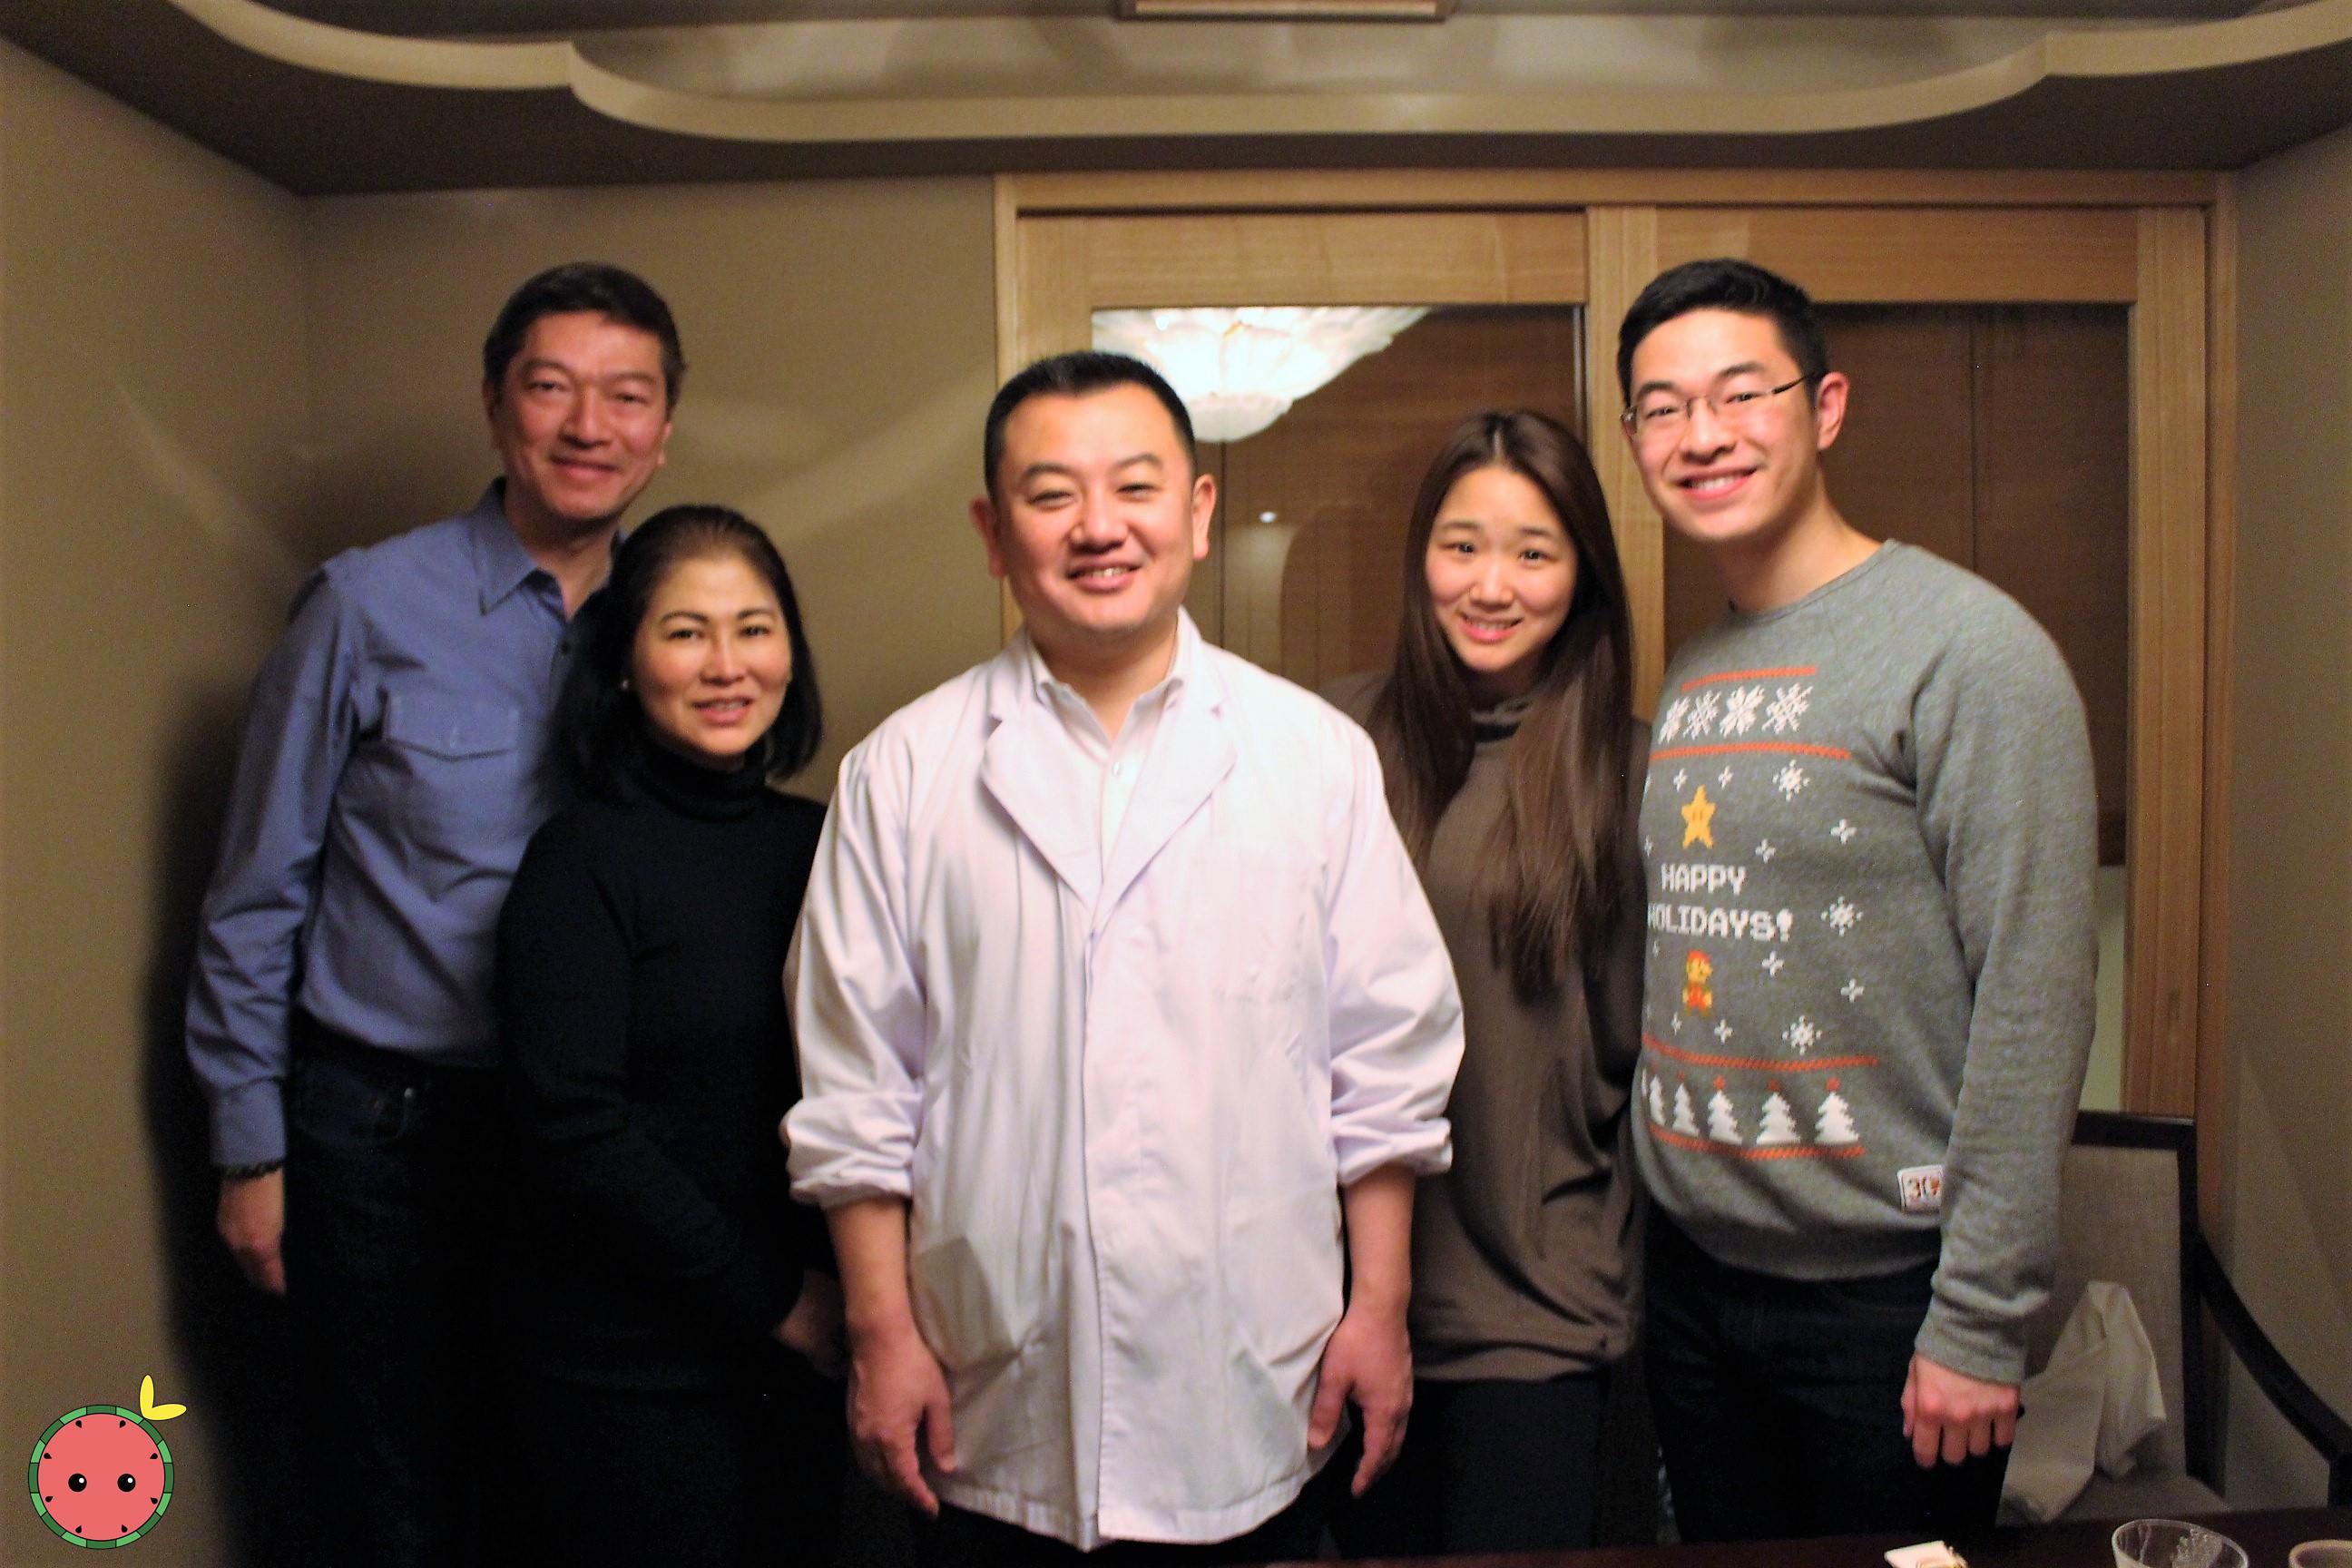 Our Amazing Chef, Toru Okuda